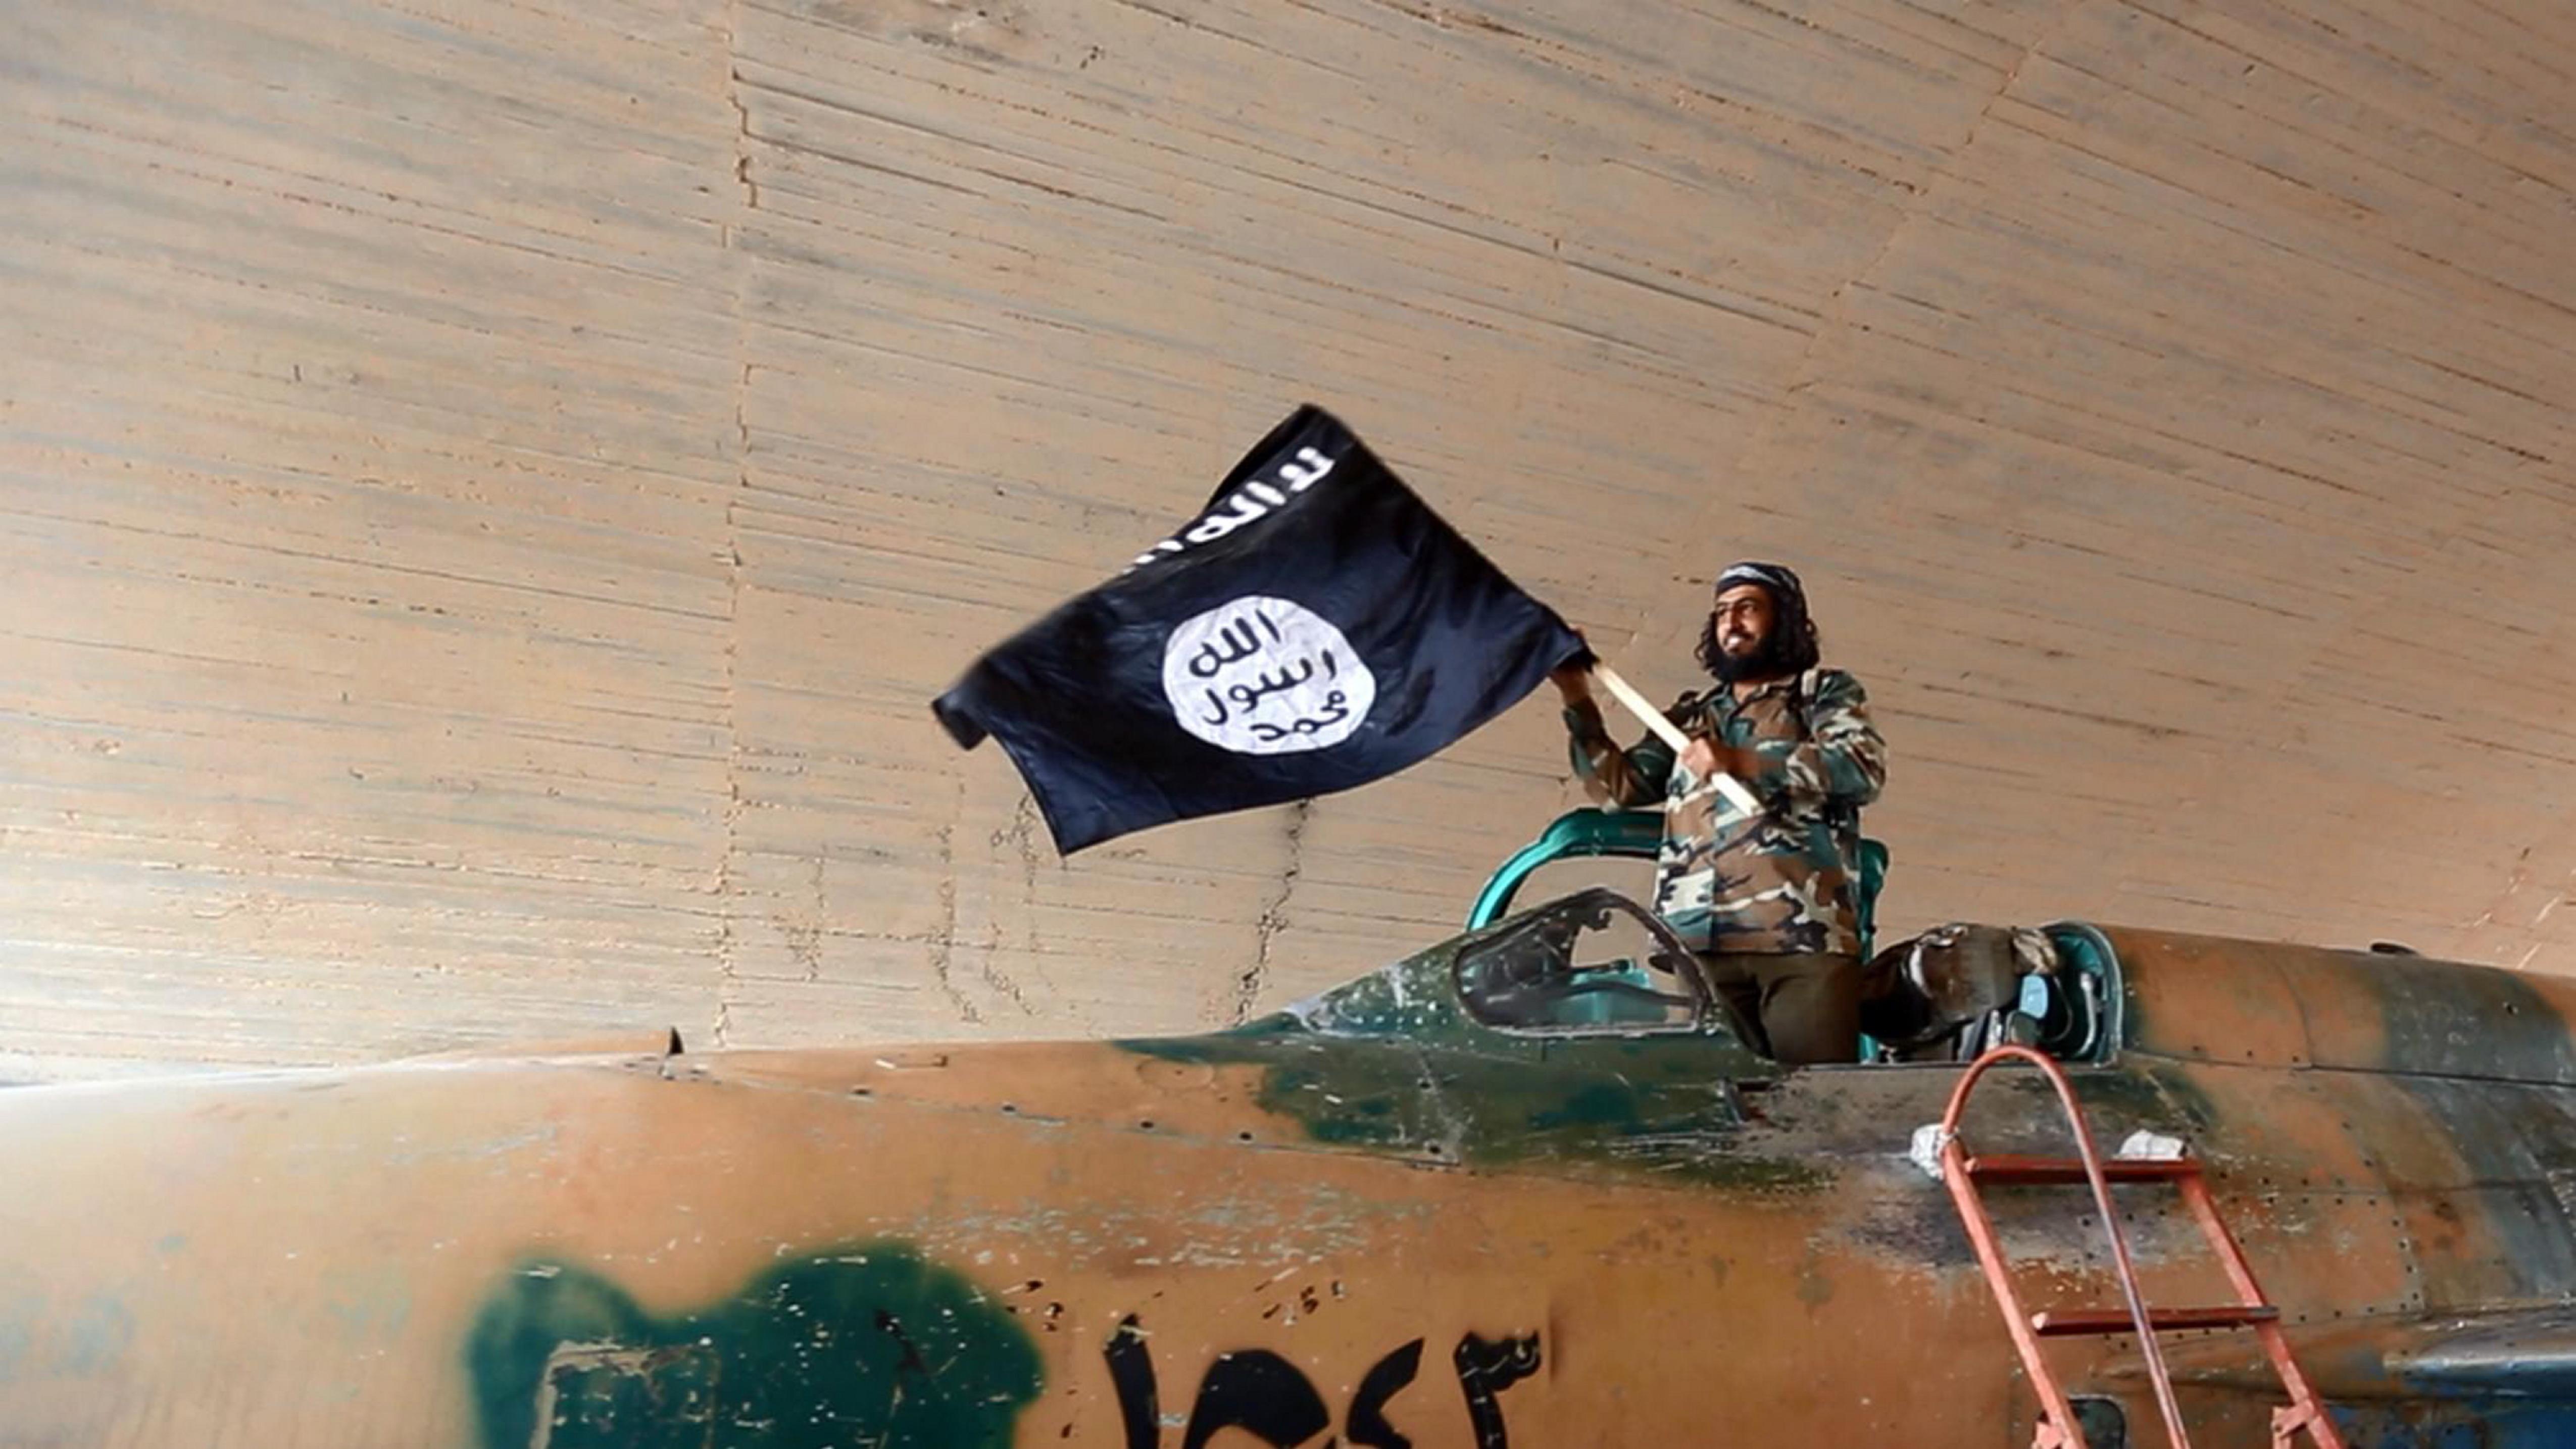 فيديوهات داعش